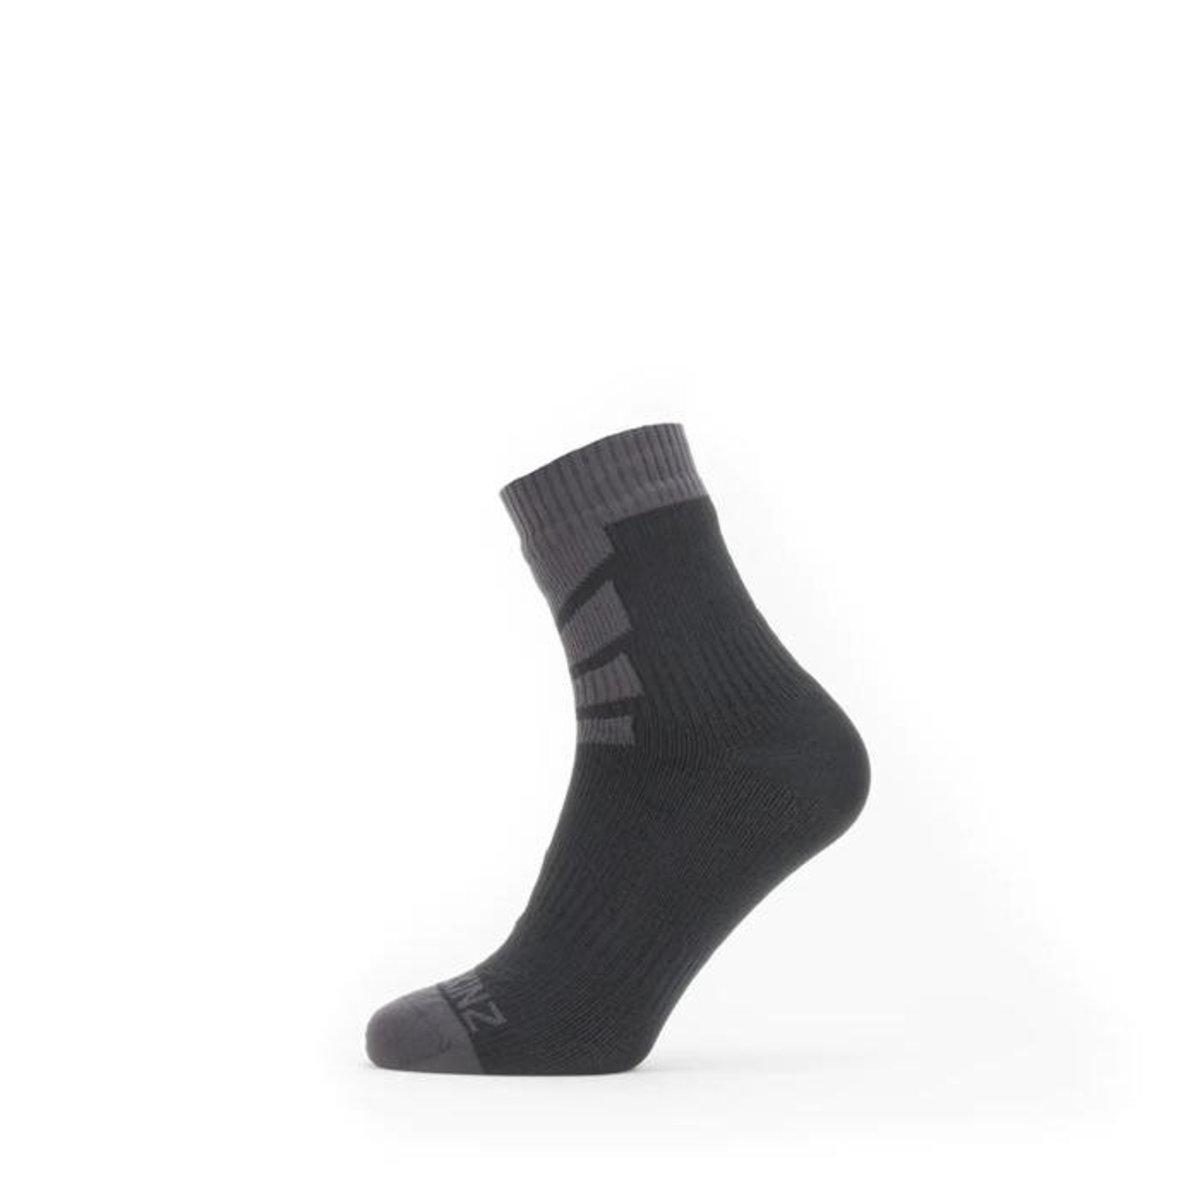 Warm Weather Ankle Black/Grey